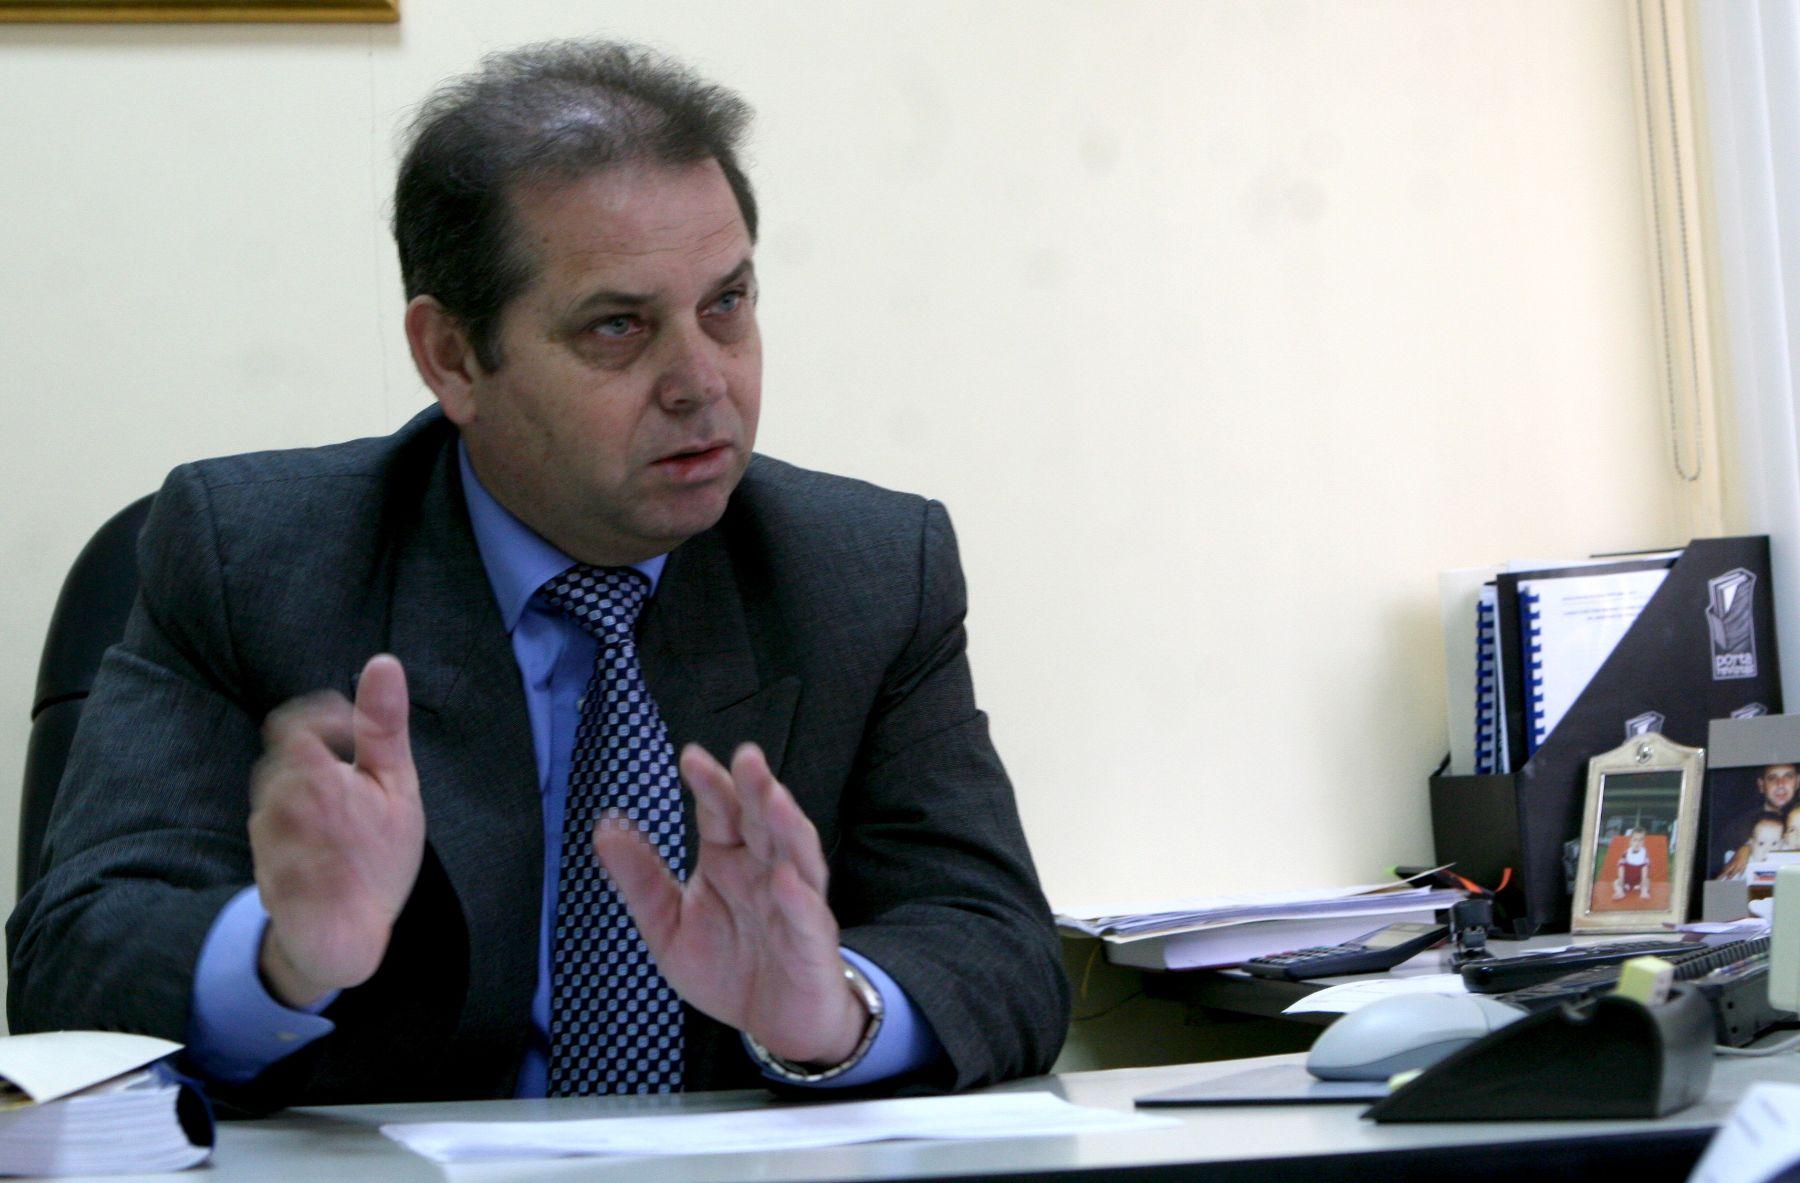 Viceministro de Trabajo, Augusto Eguiguren Praeli. ANDINA/archivo